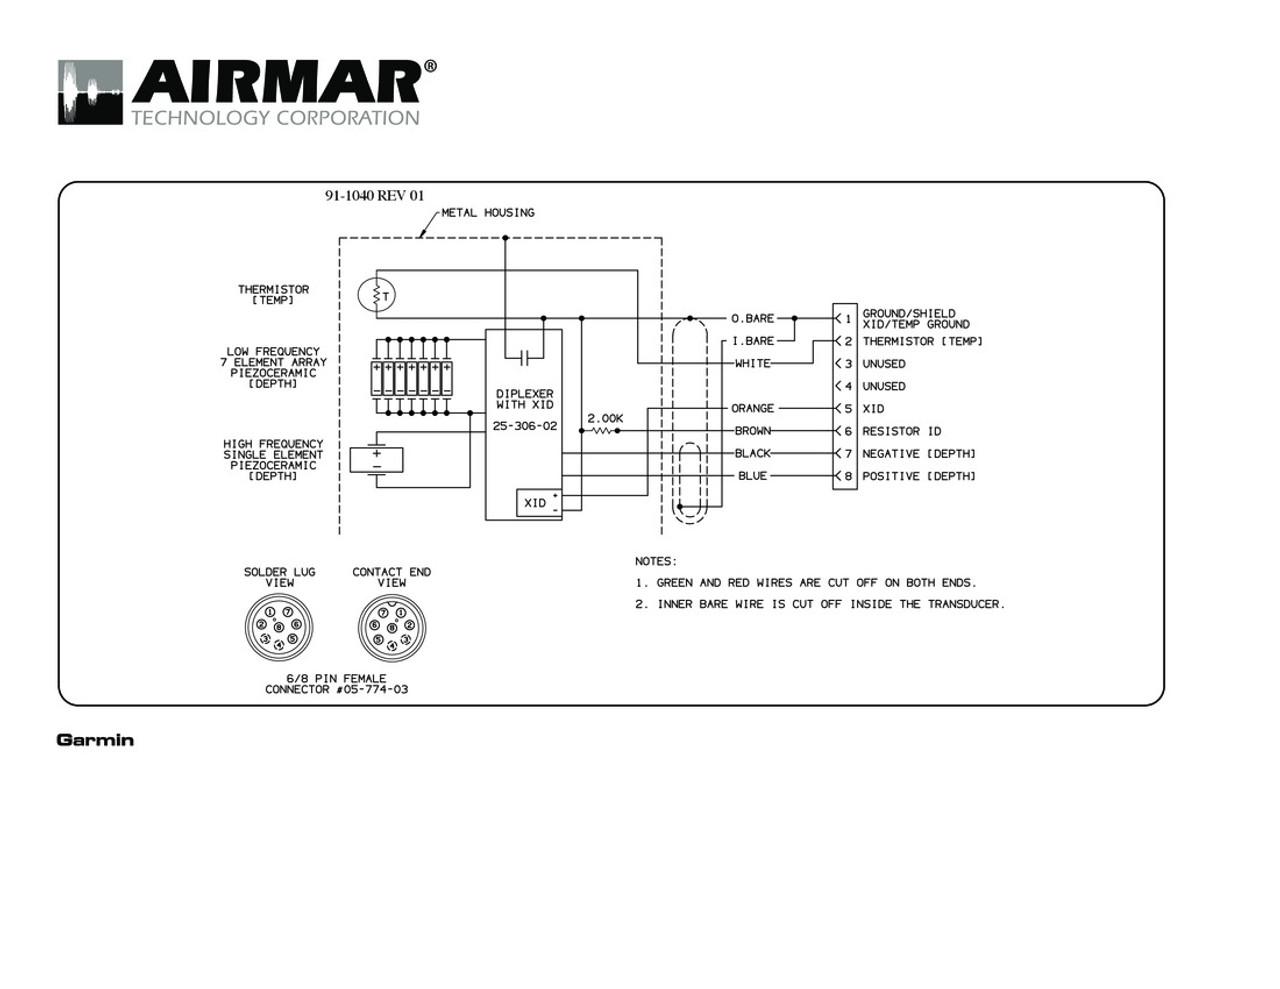 medium resolution of garmin 128 wiring diagram wiring diagram datasourcegarmin 128 wiring diagram manual e book garmin 128 wiring